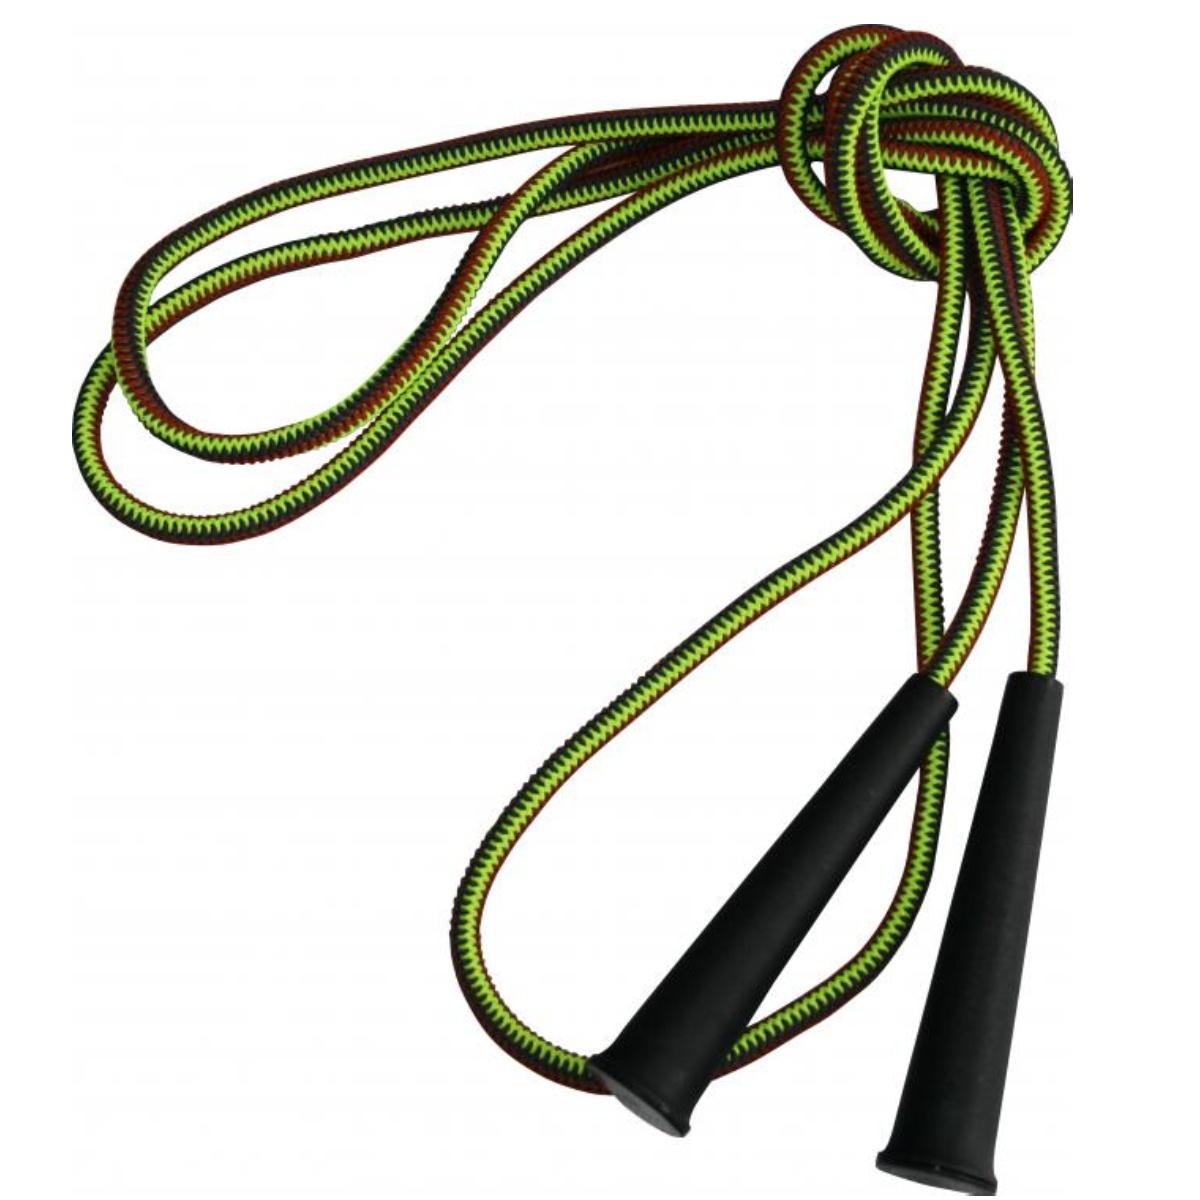 Gymnastické švihadlo elastické 2,5 metru